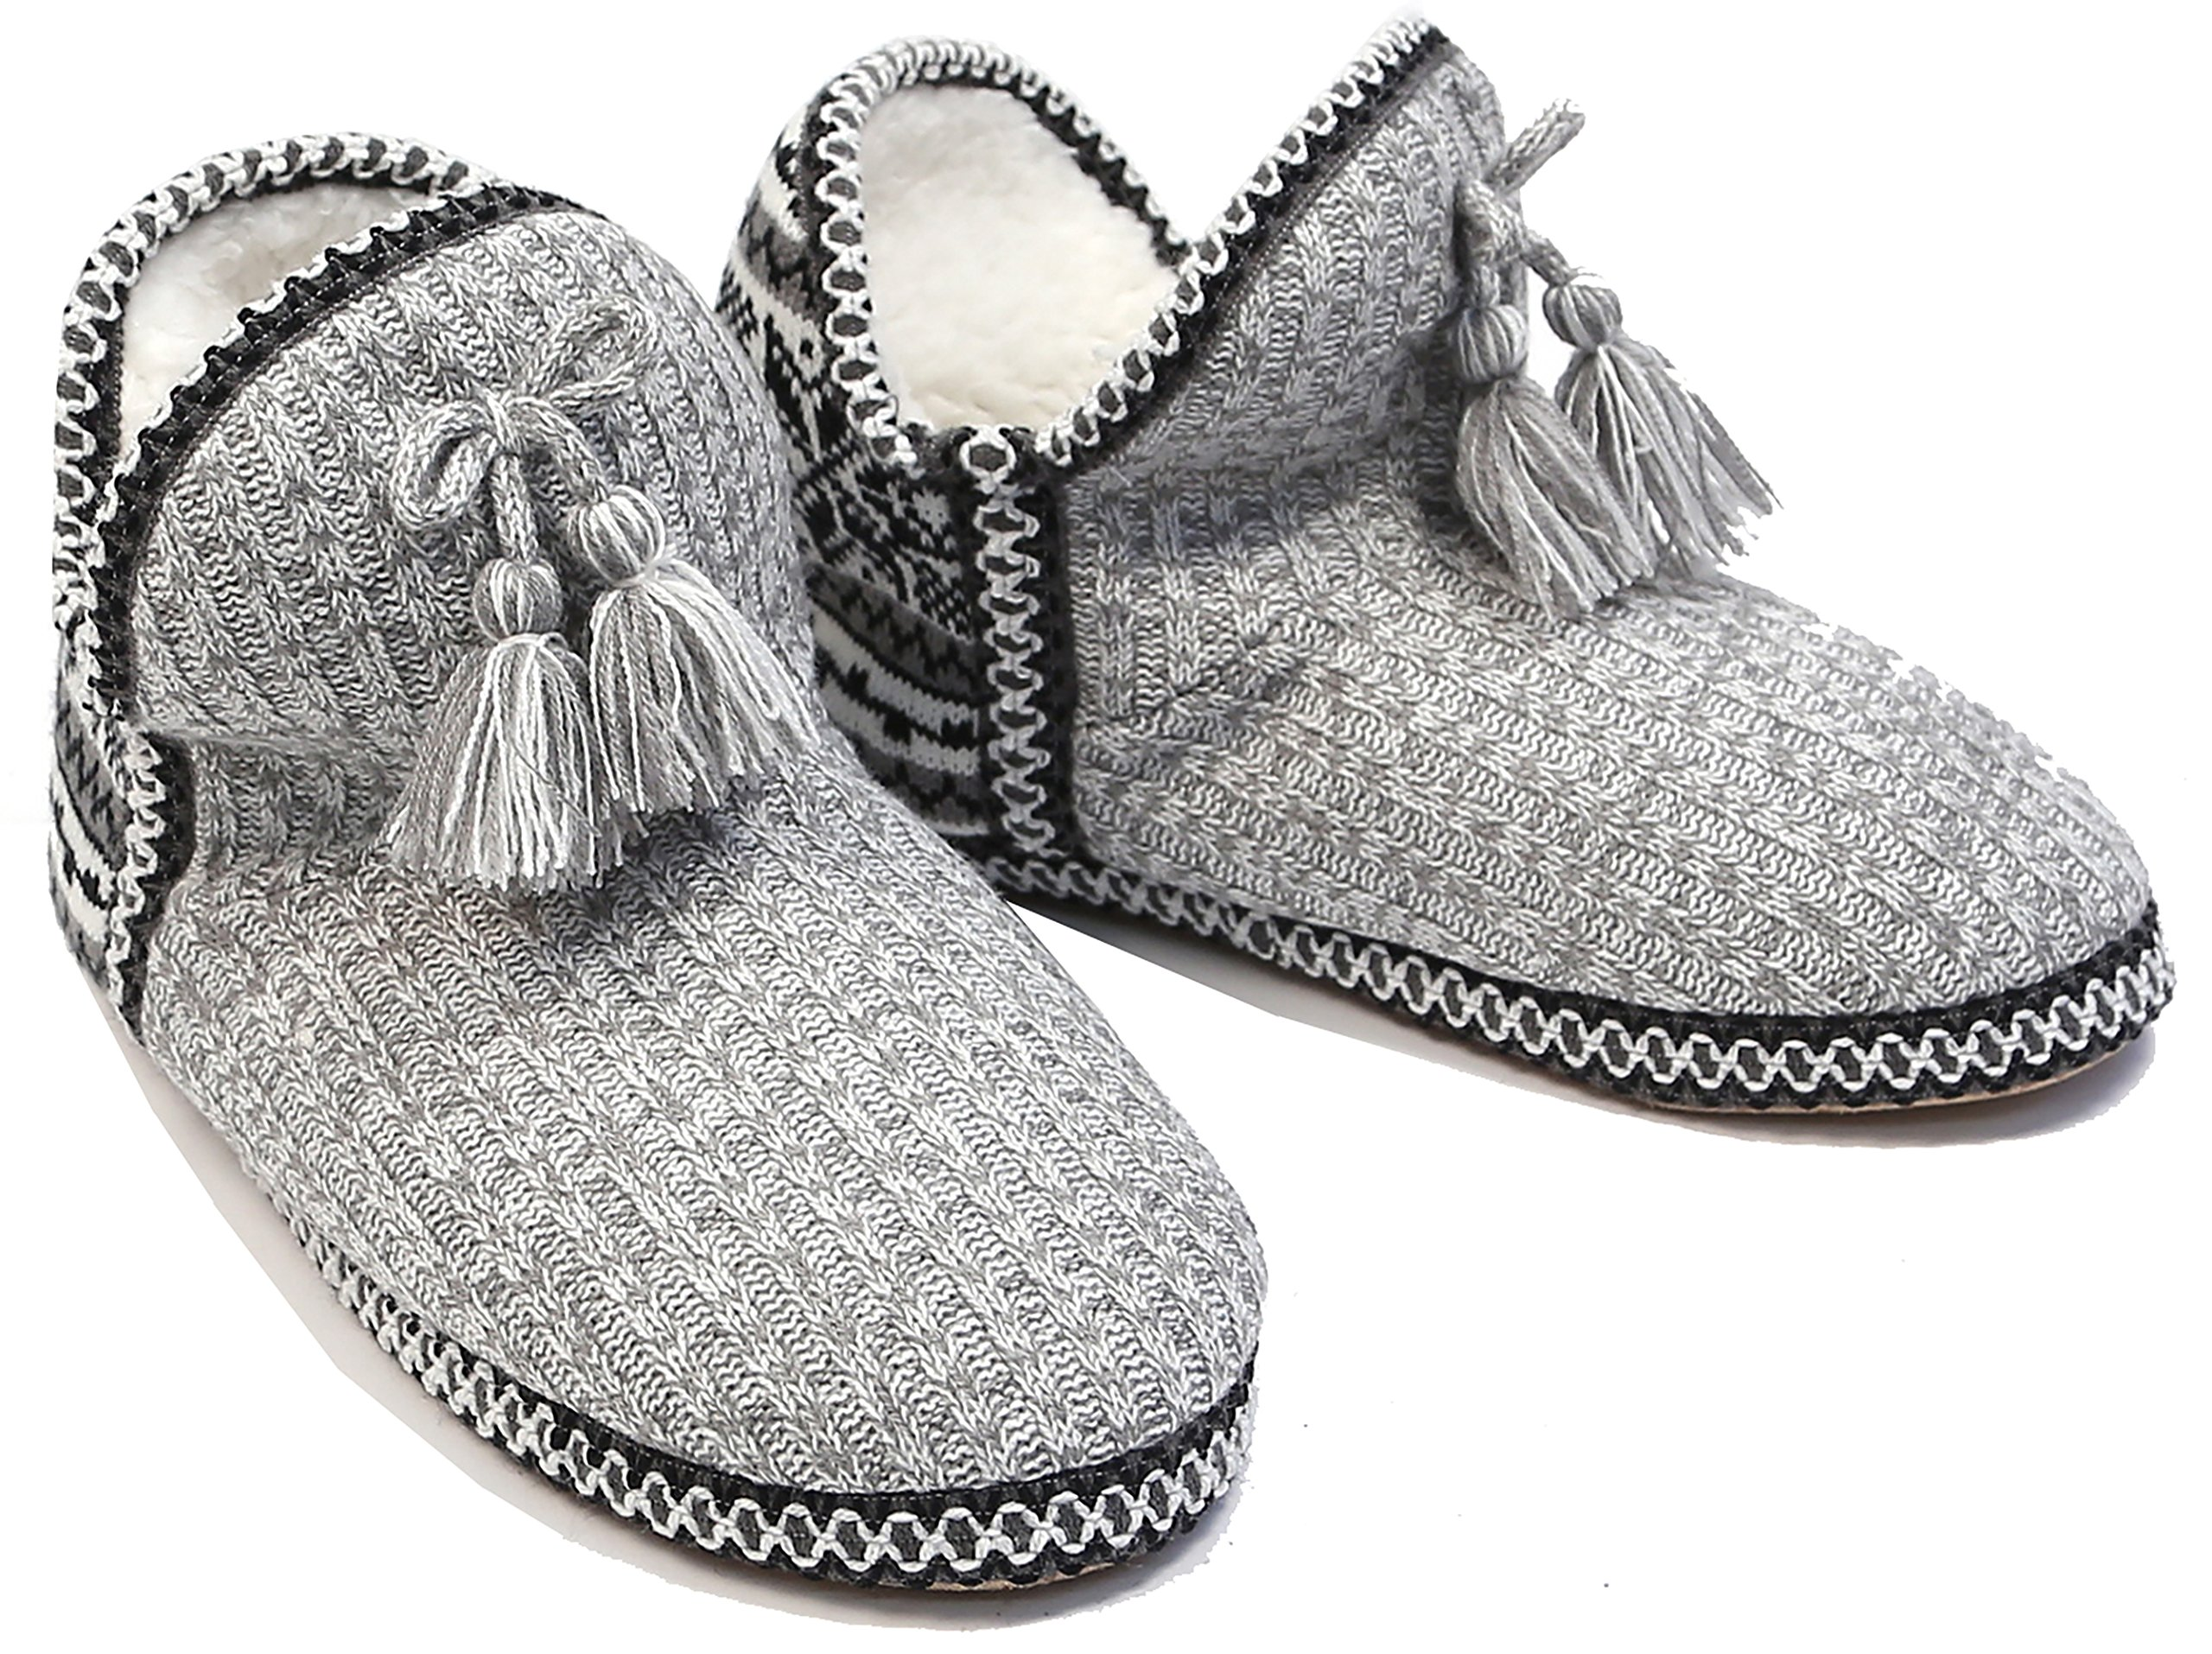 MIRMARU Women's Woven Fuzzy Plush Lining with Anti-Slip Sole Indoor House Slipper Shoe(Light Grey,SM)